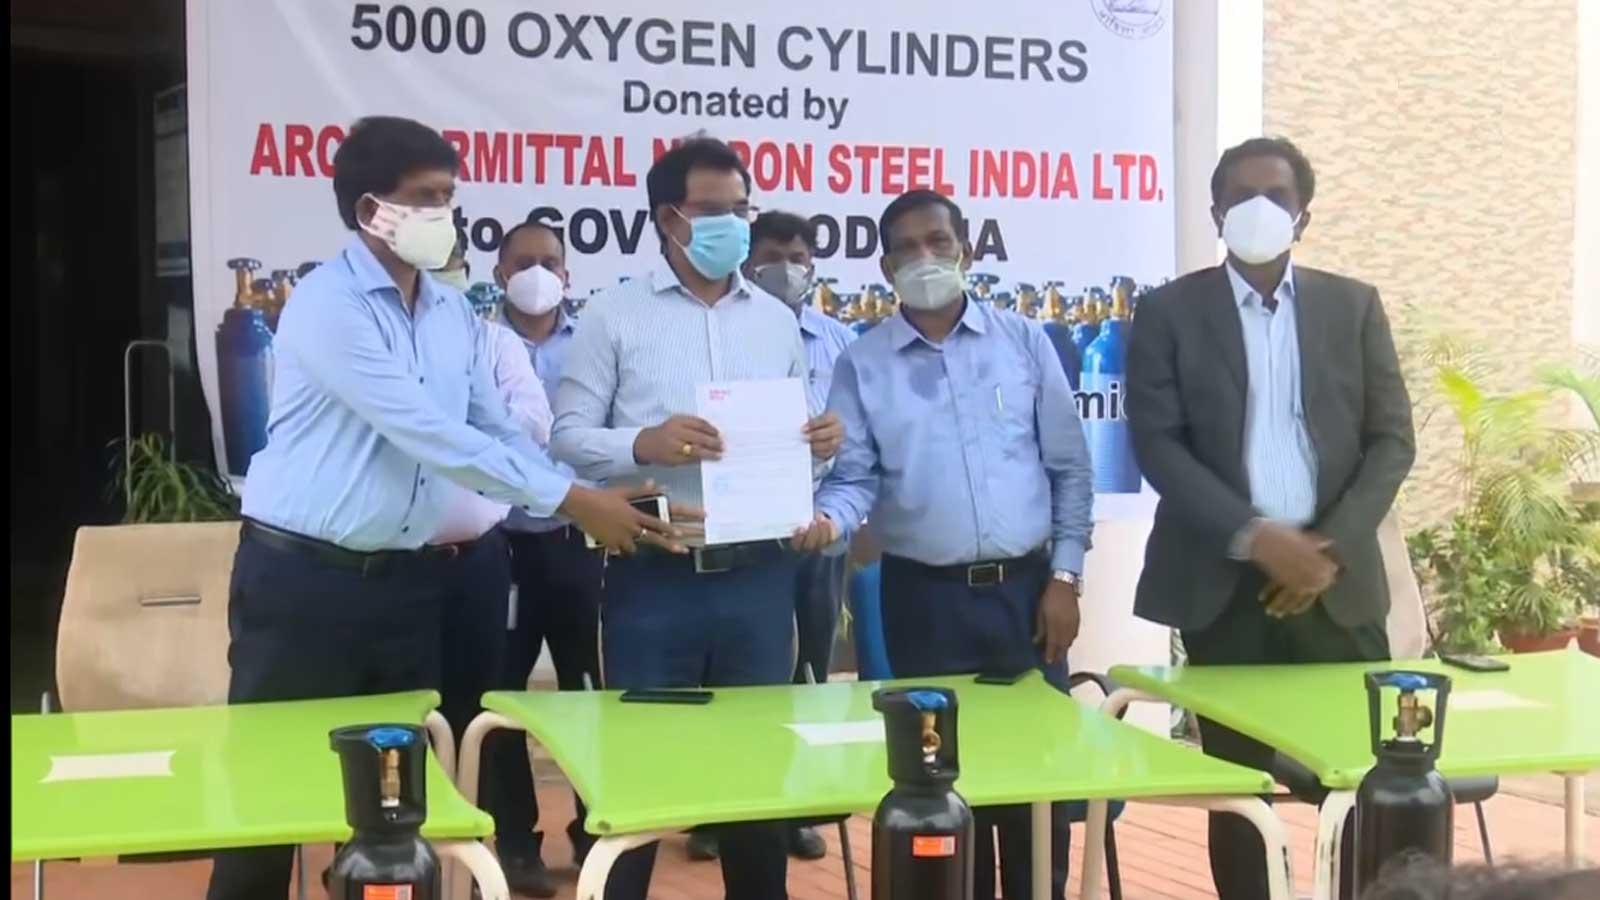 arcelormittal-nippon-steel-india-donates-over-5000-oxygen-cylinders-to-odisha-govt